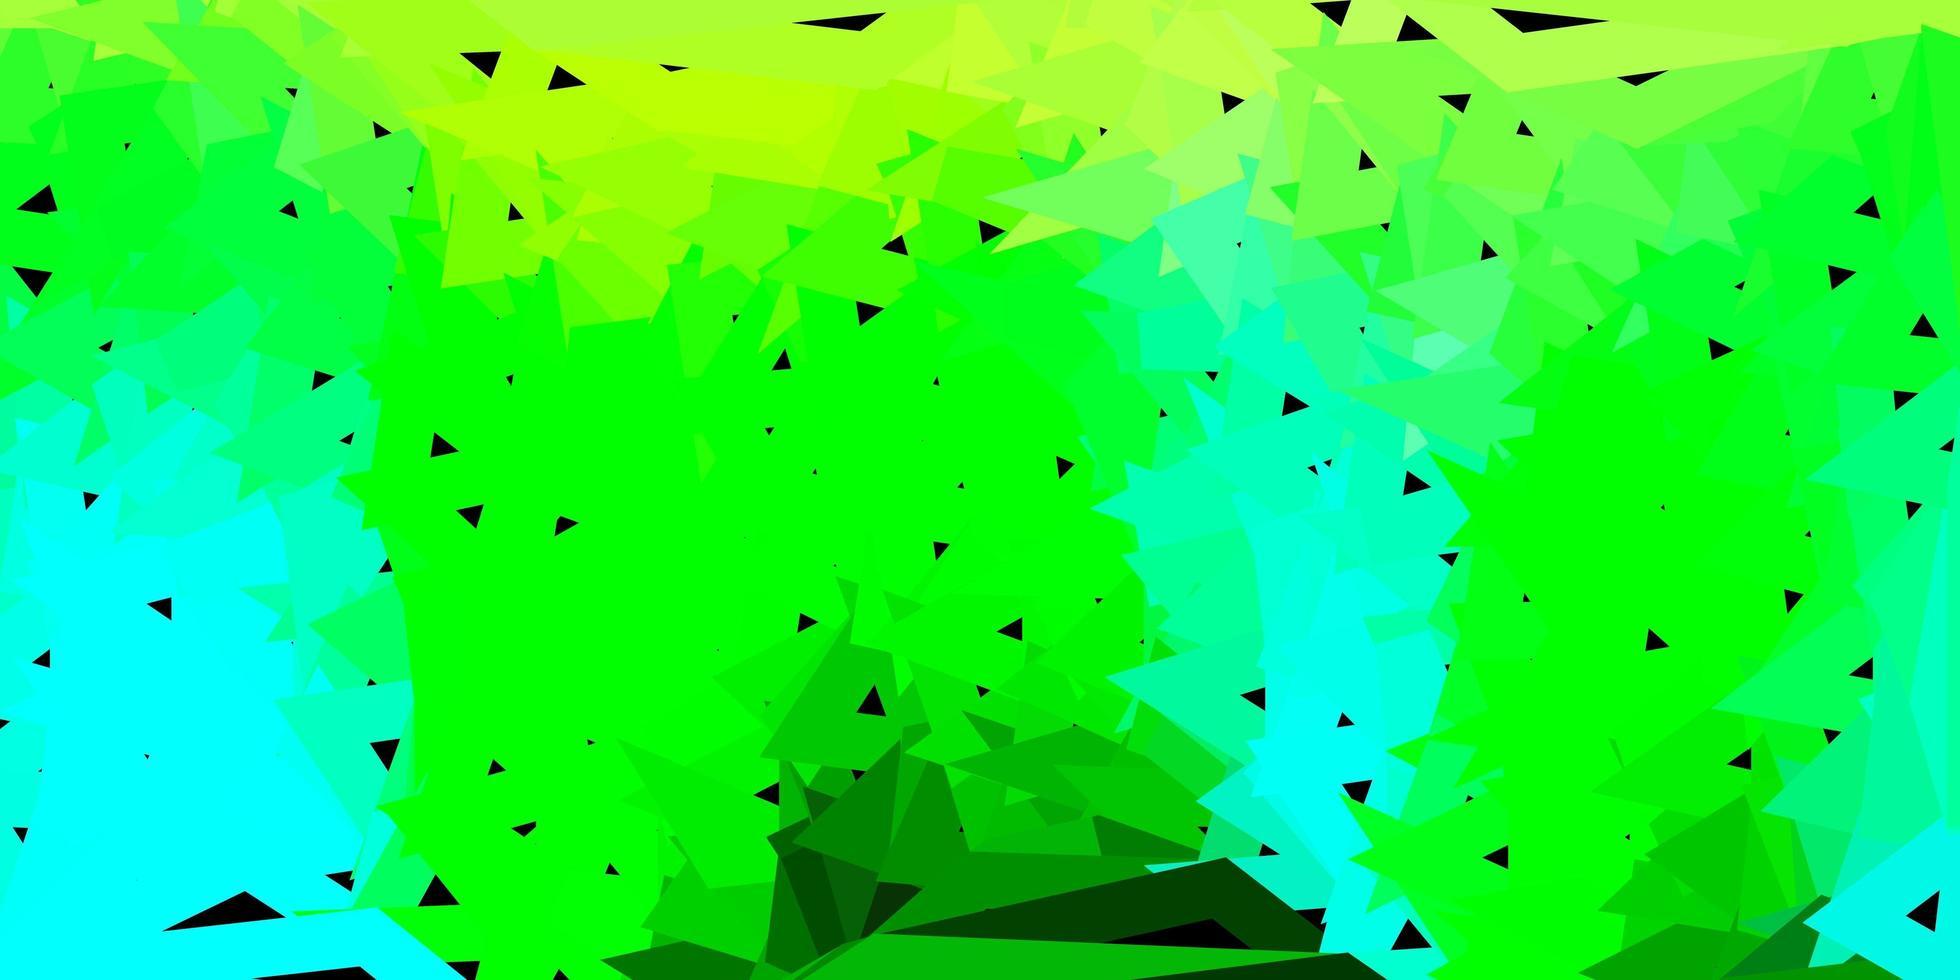 motif polygonal de vecteur bleu clair, vert.